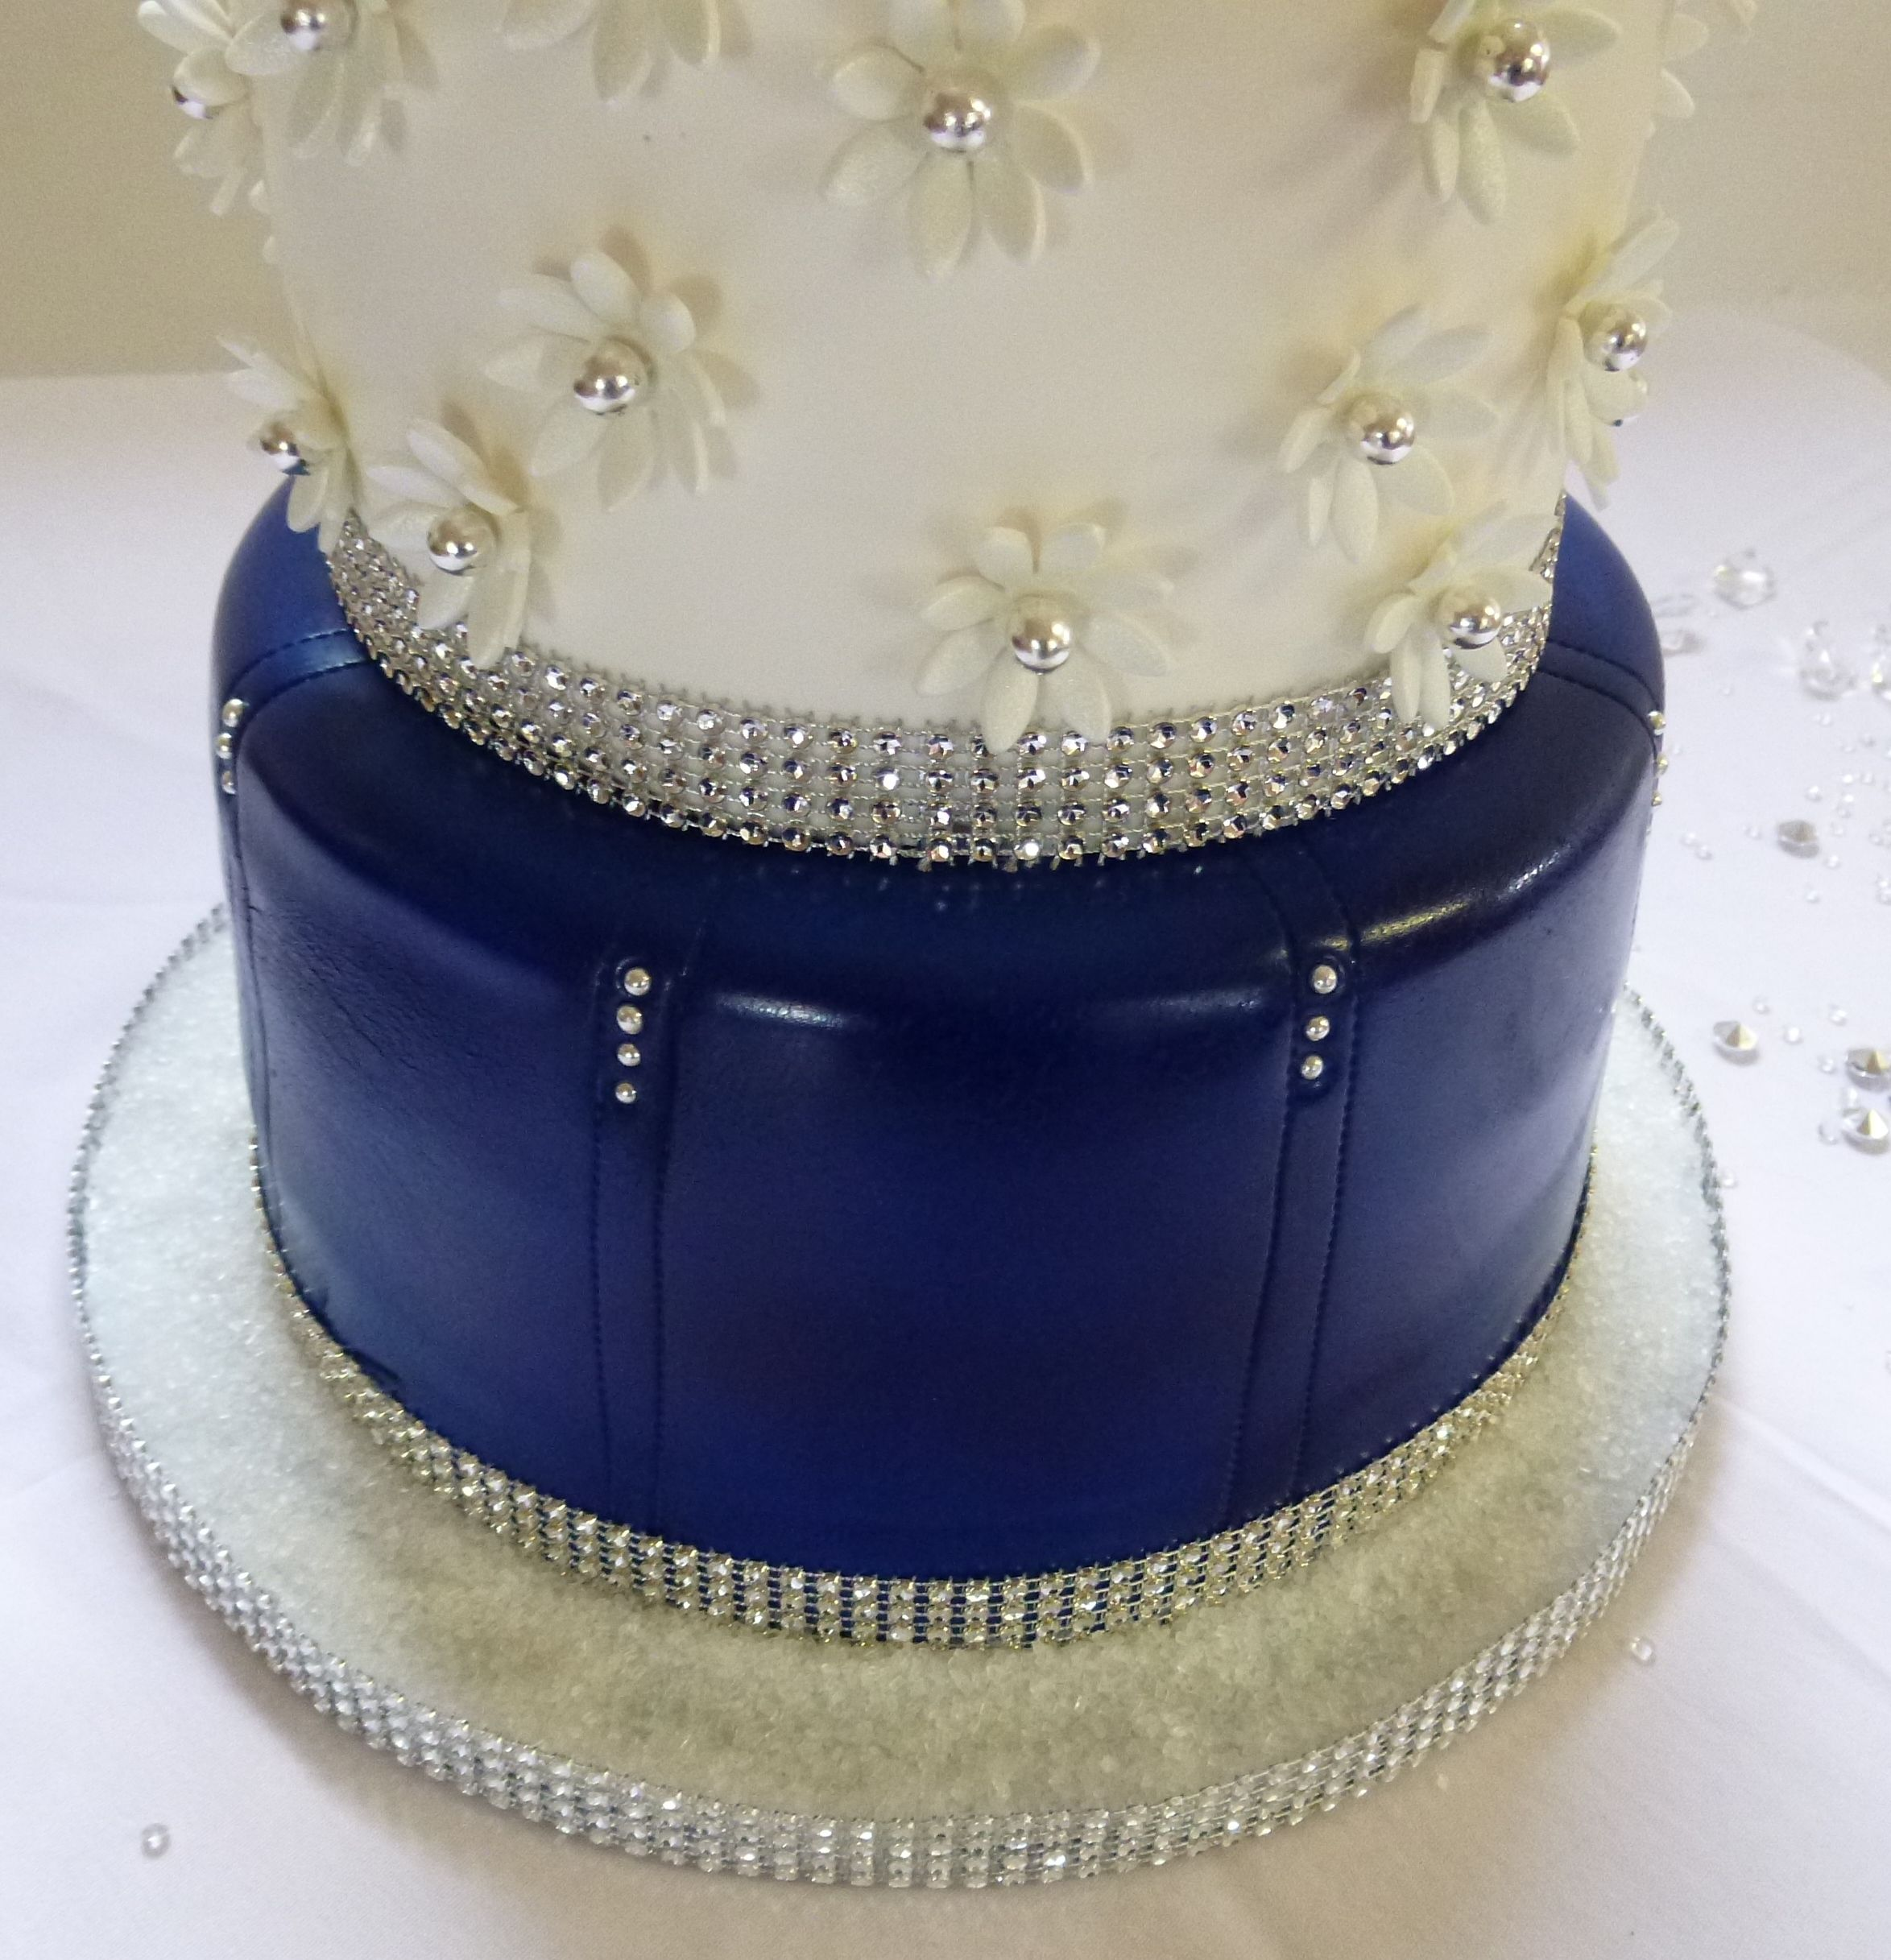 Denim And Diamonds Cake cakepins